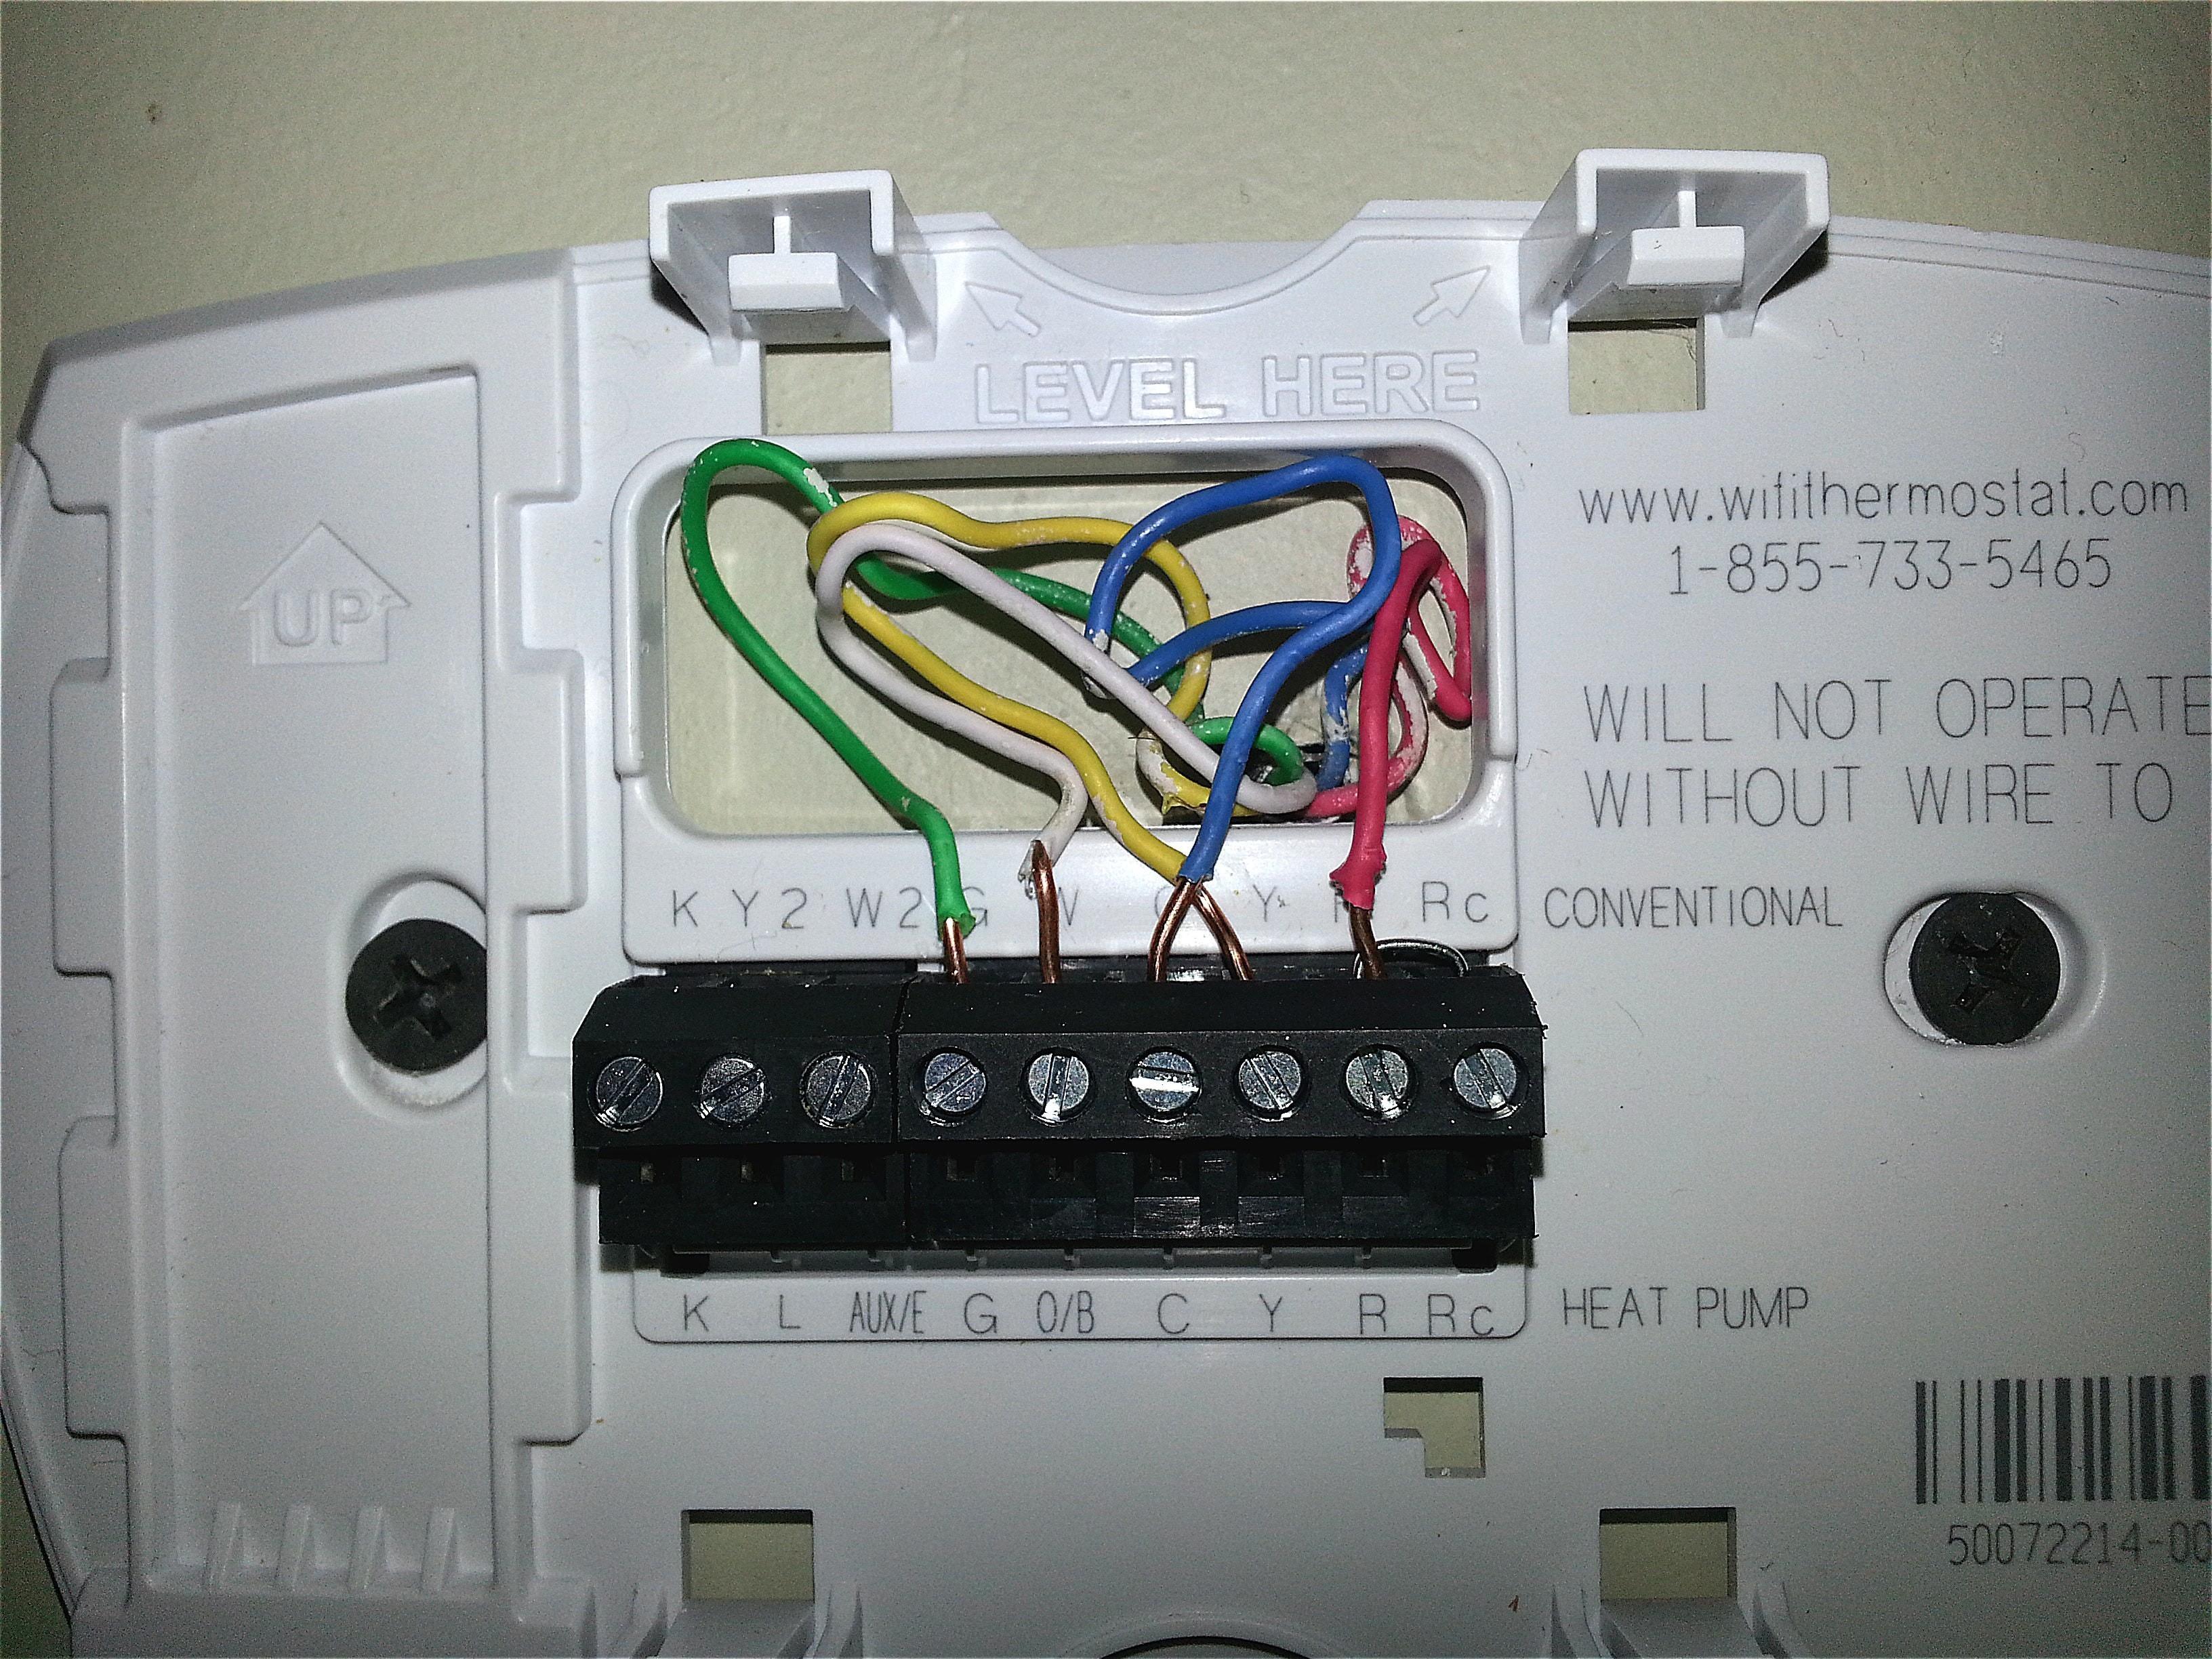 Honeywell Rth3100c thermostat Wiring Diagram Wiring Diagram for Honeywell thermostat with Heat Pump New 7 Wire Of Honeywell Rth3100c thermostat Wiring Diagram